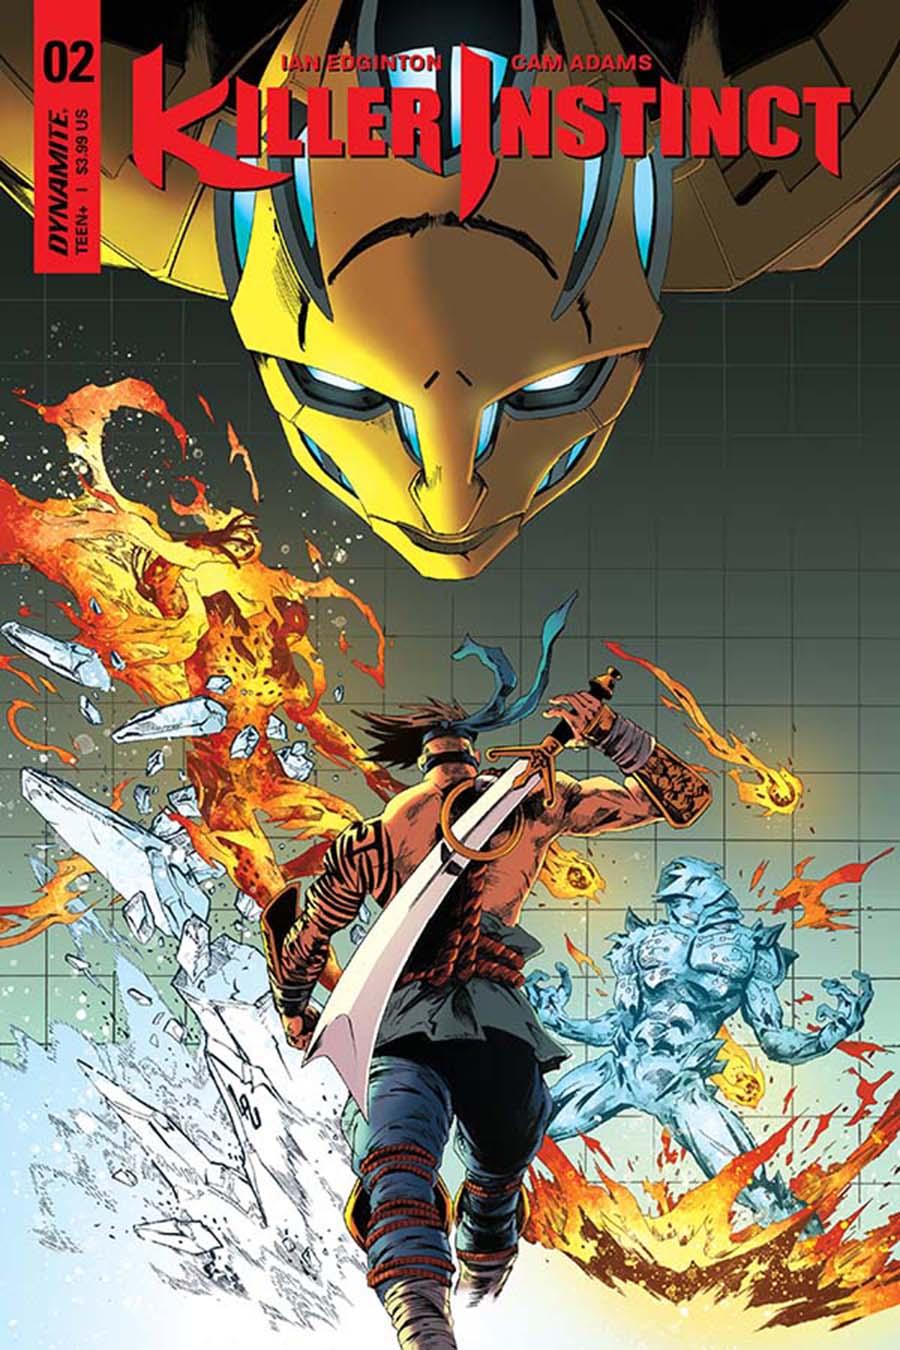 Killer Instinct Vol 2 #2 Cover B Variant Jonathan Lau Cover